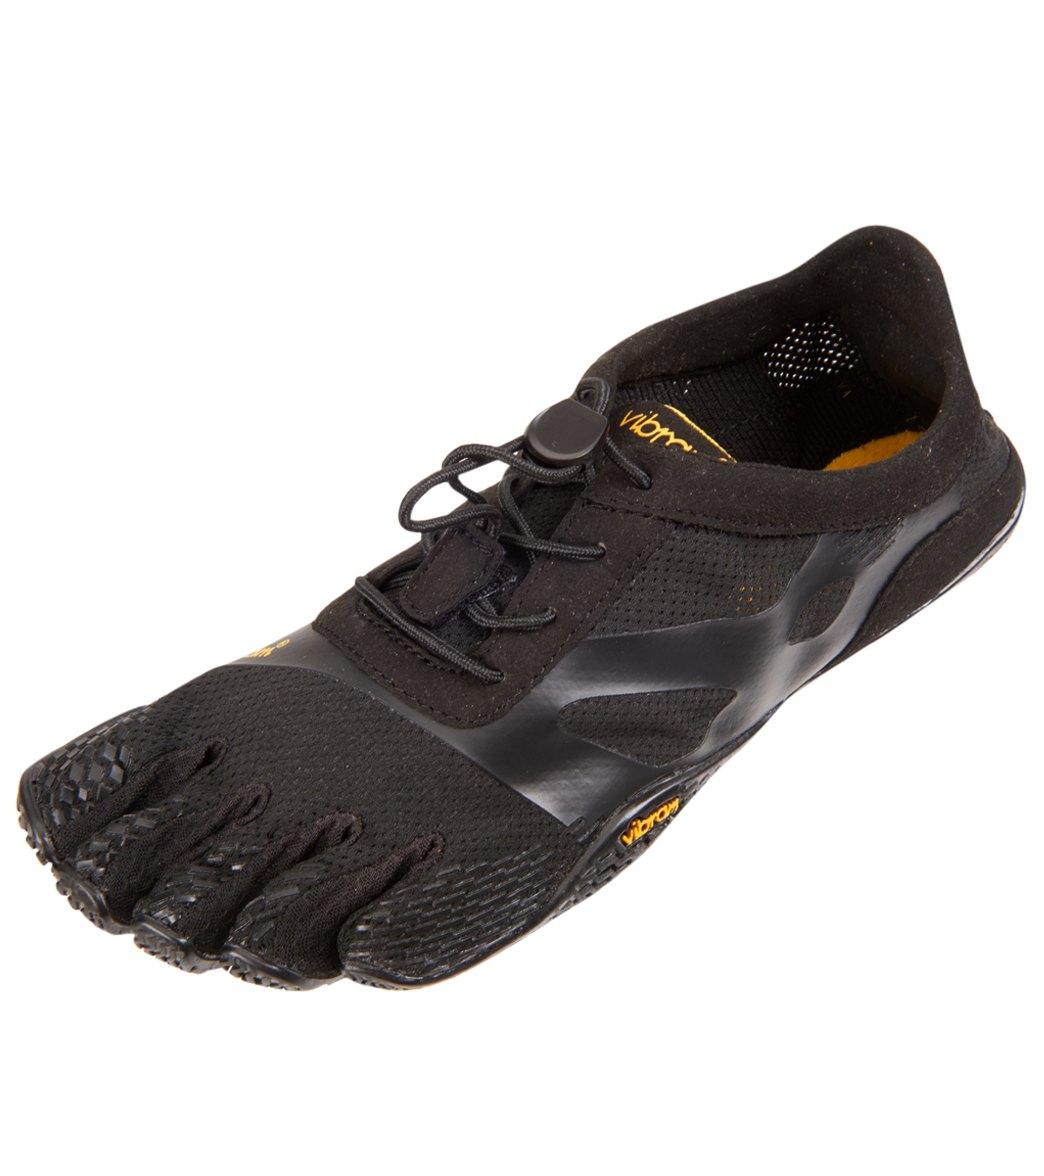 0a29ba838858 Vibram Fivefingers Women s KSO EVO Shoes at SwimOutlet.com - Free Shipping